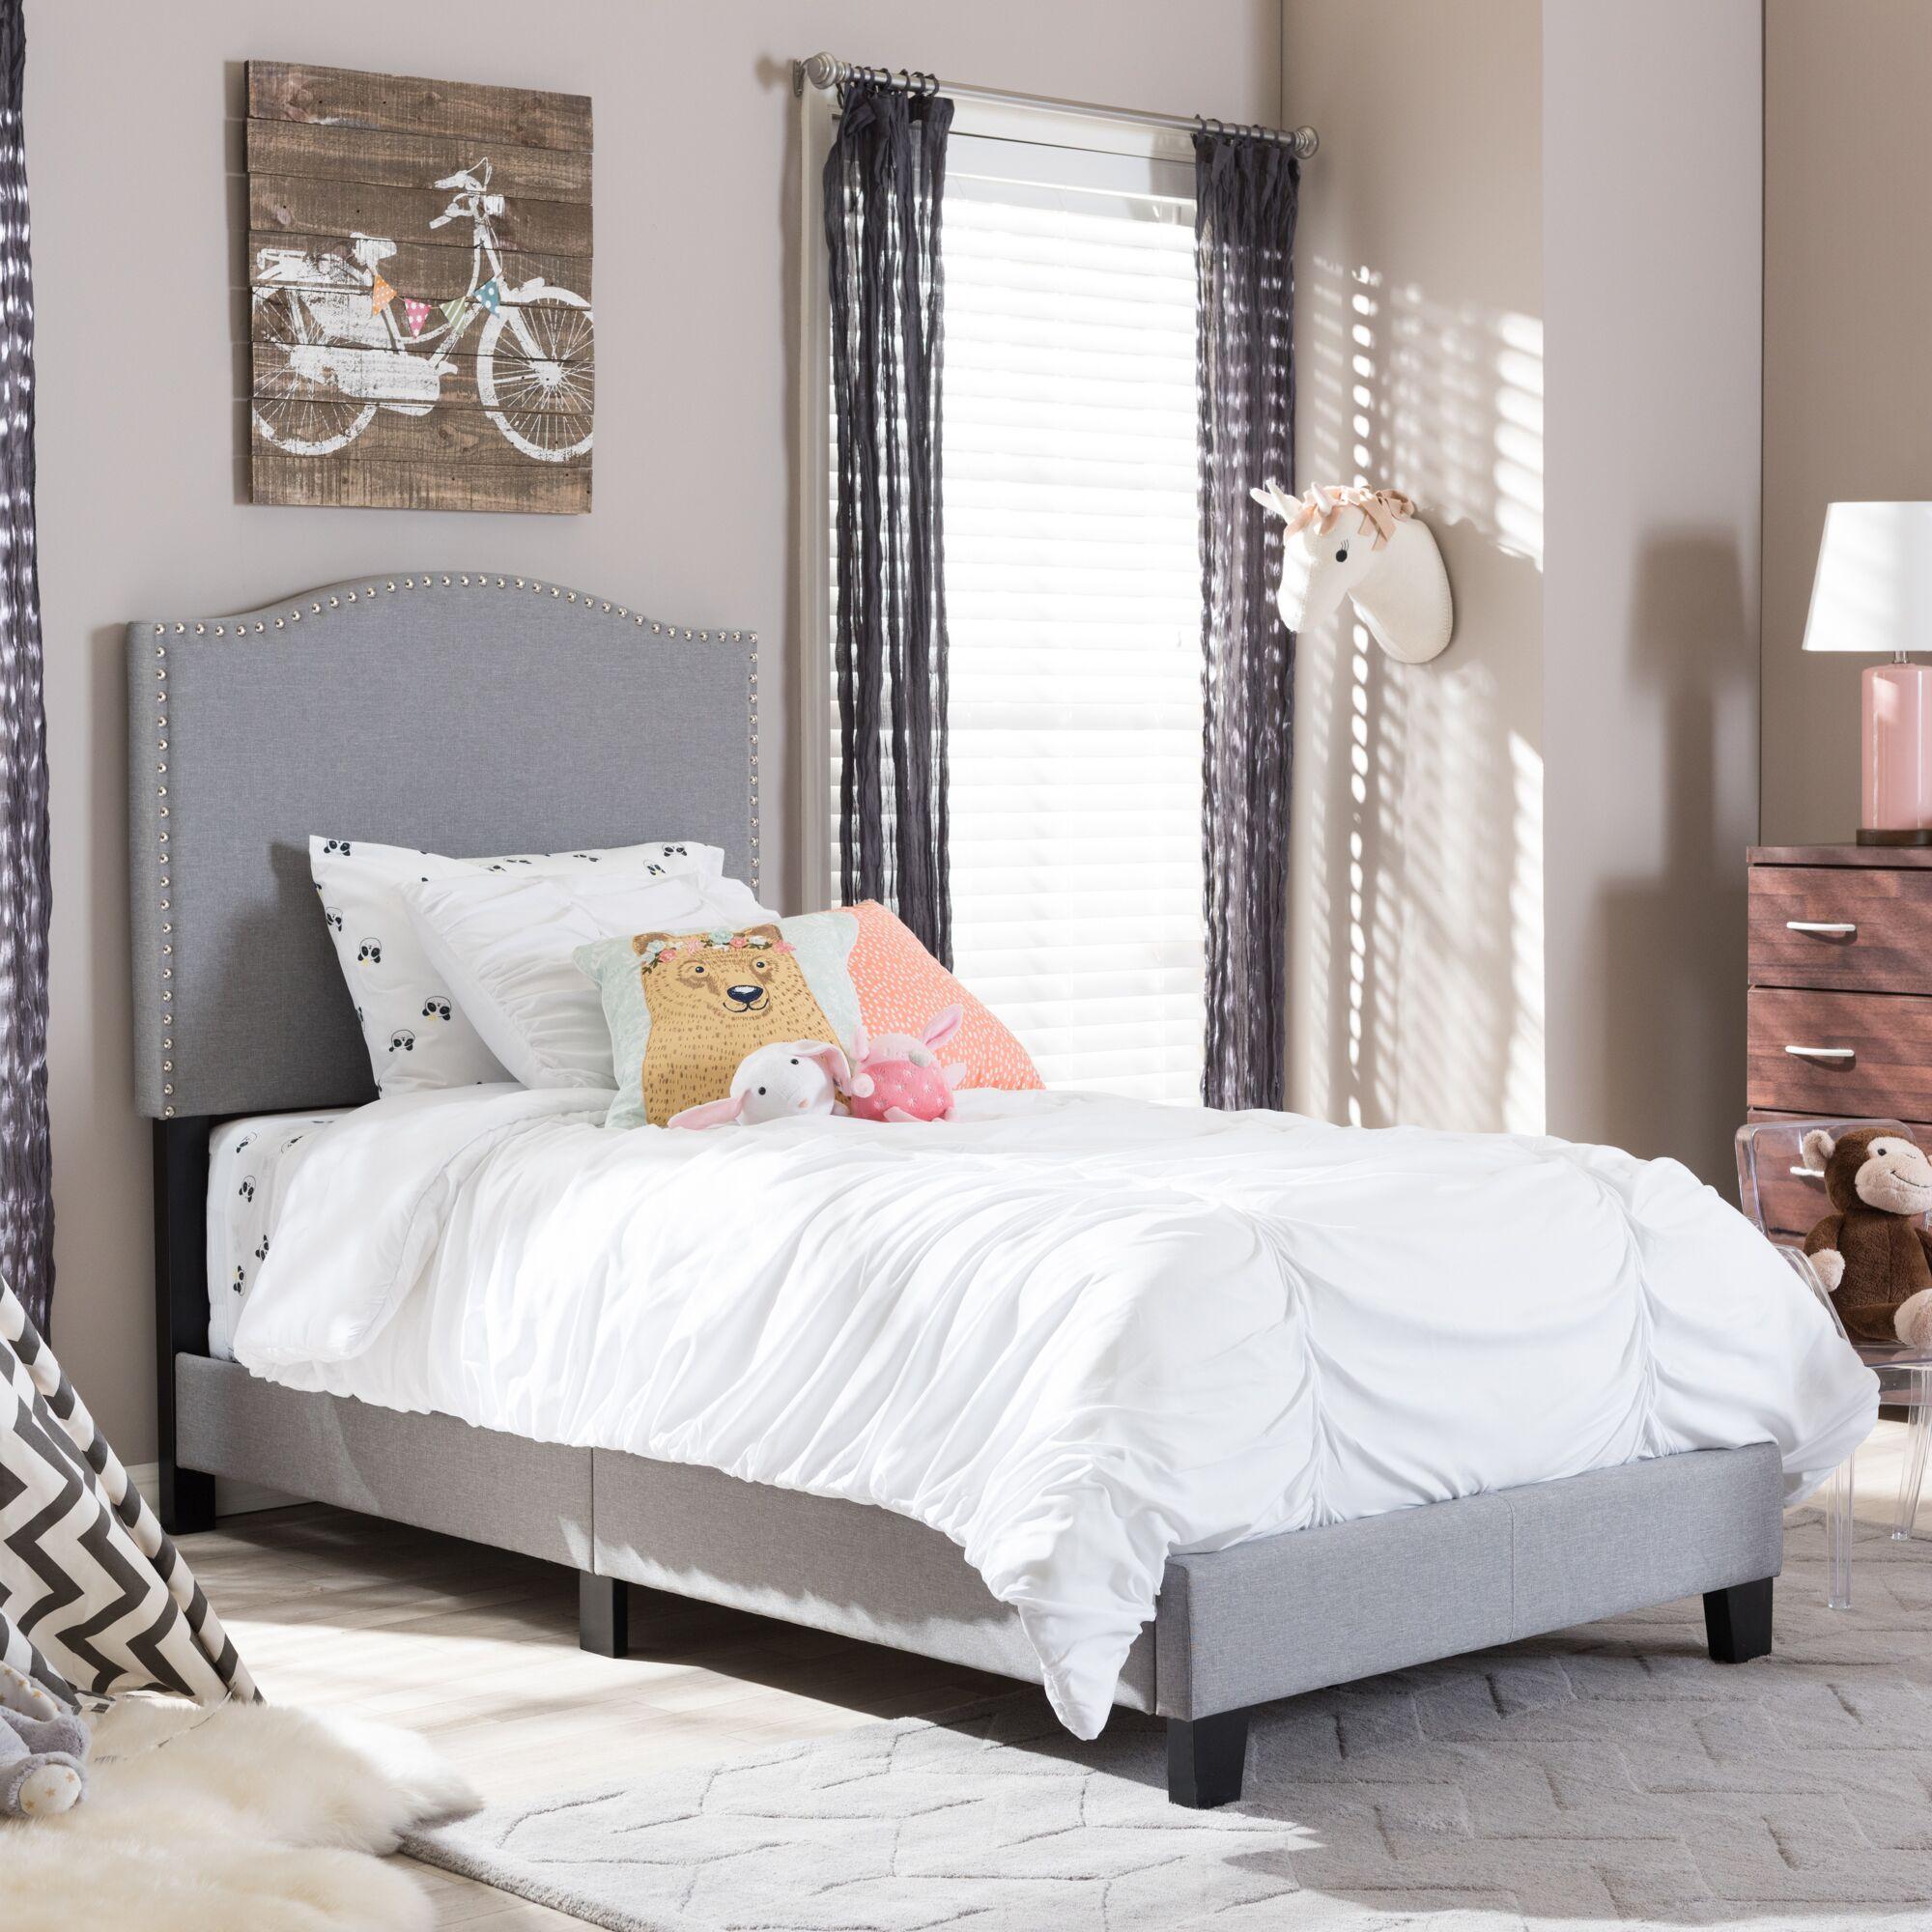 Perkinson Twin Upholstered Platform Bed